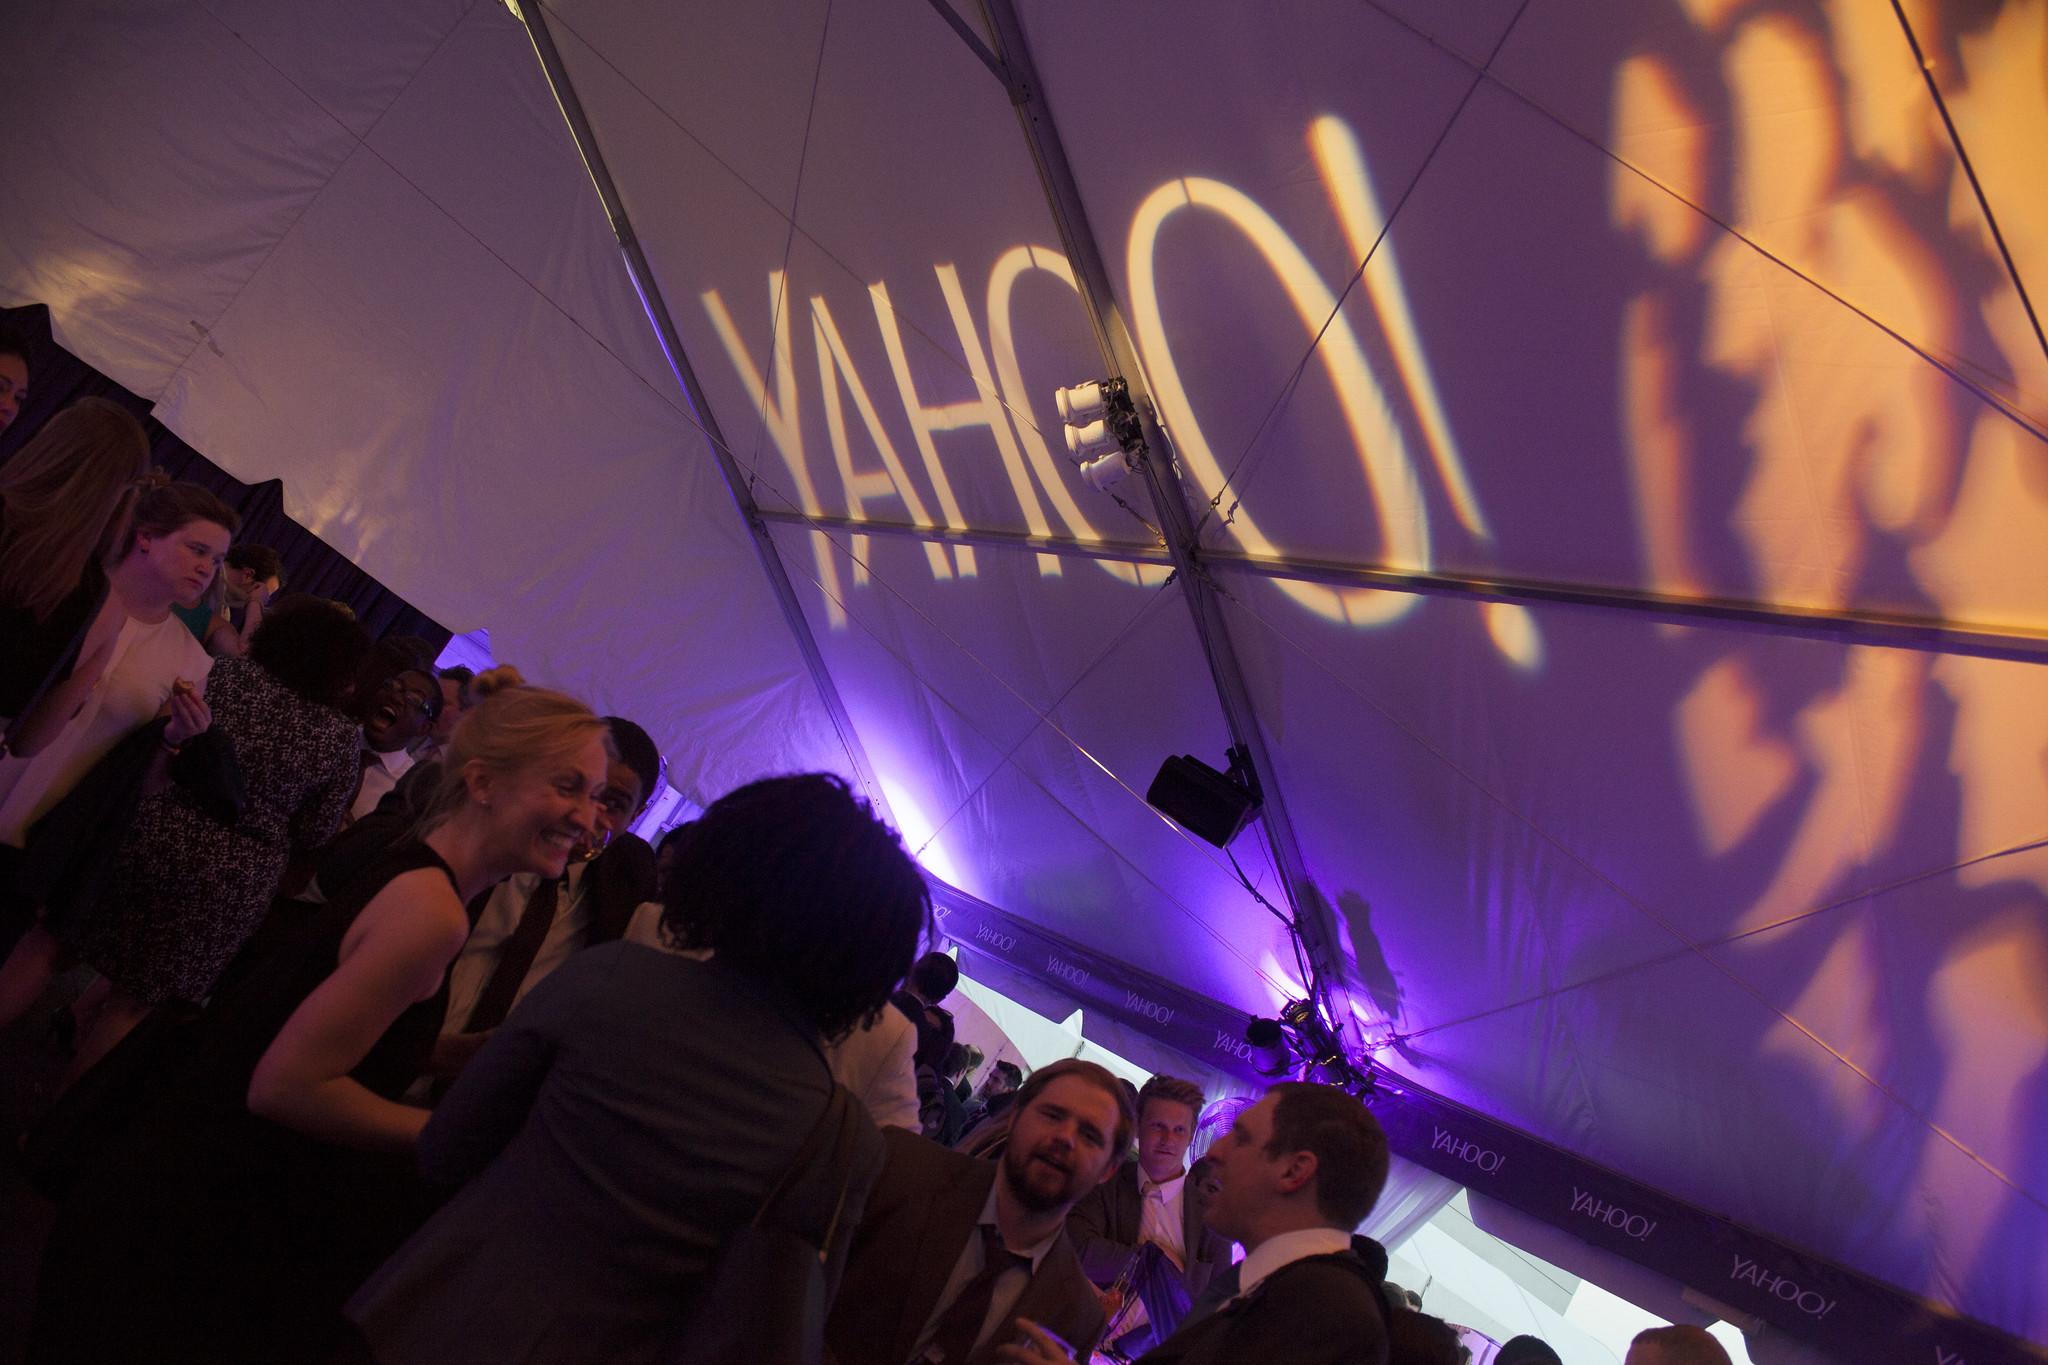 Yahoo notizie online dating